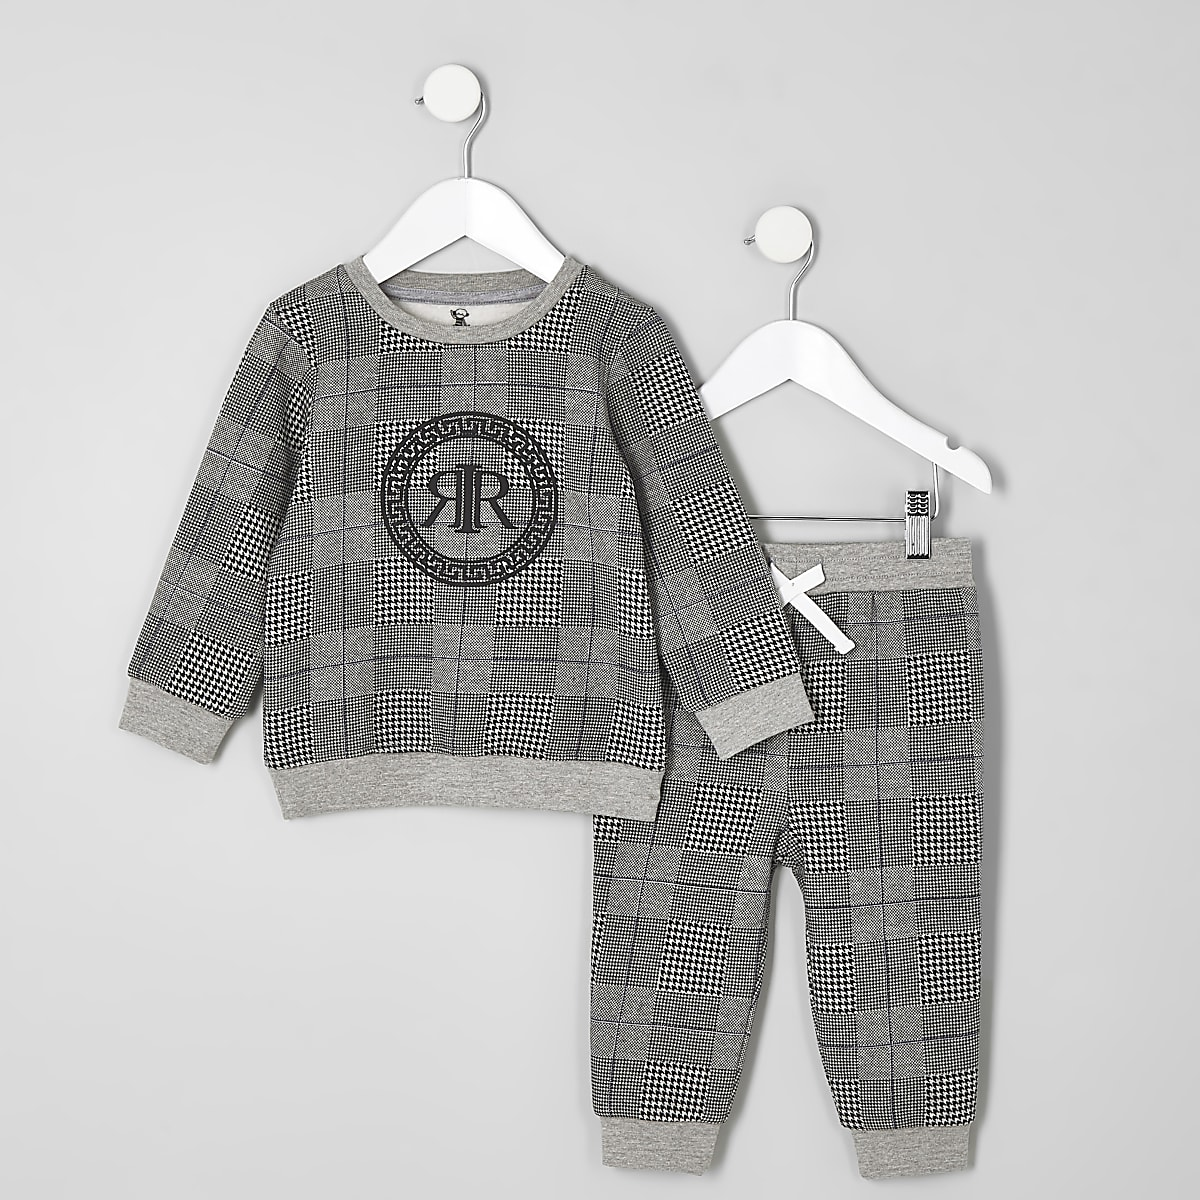 Mini boys grey check RI sweatshirt outfit